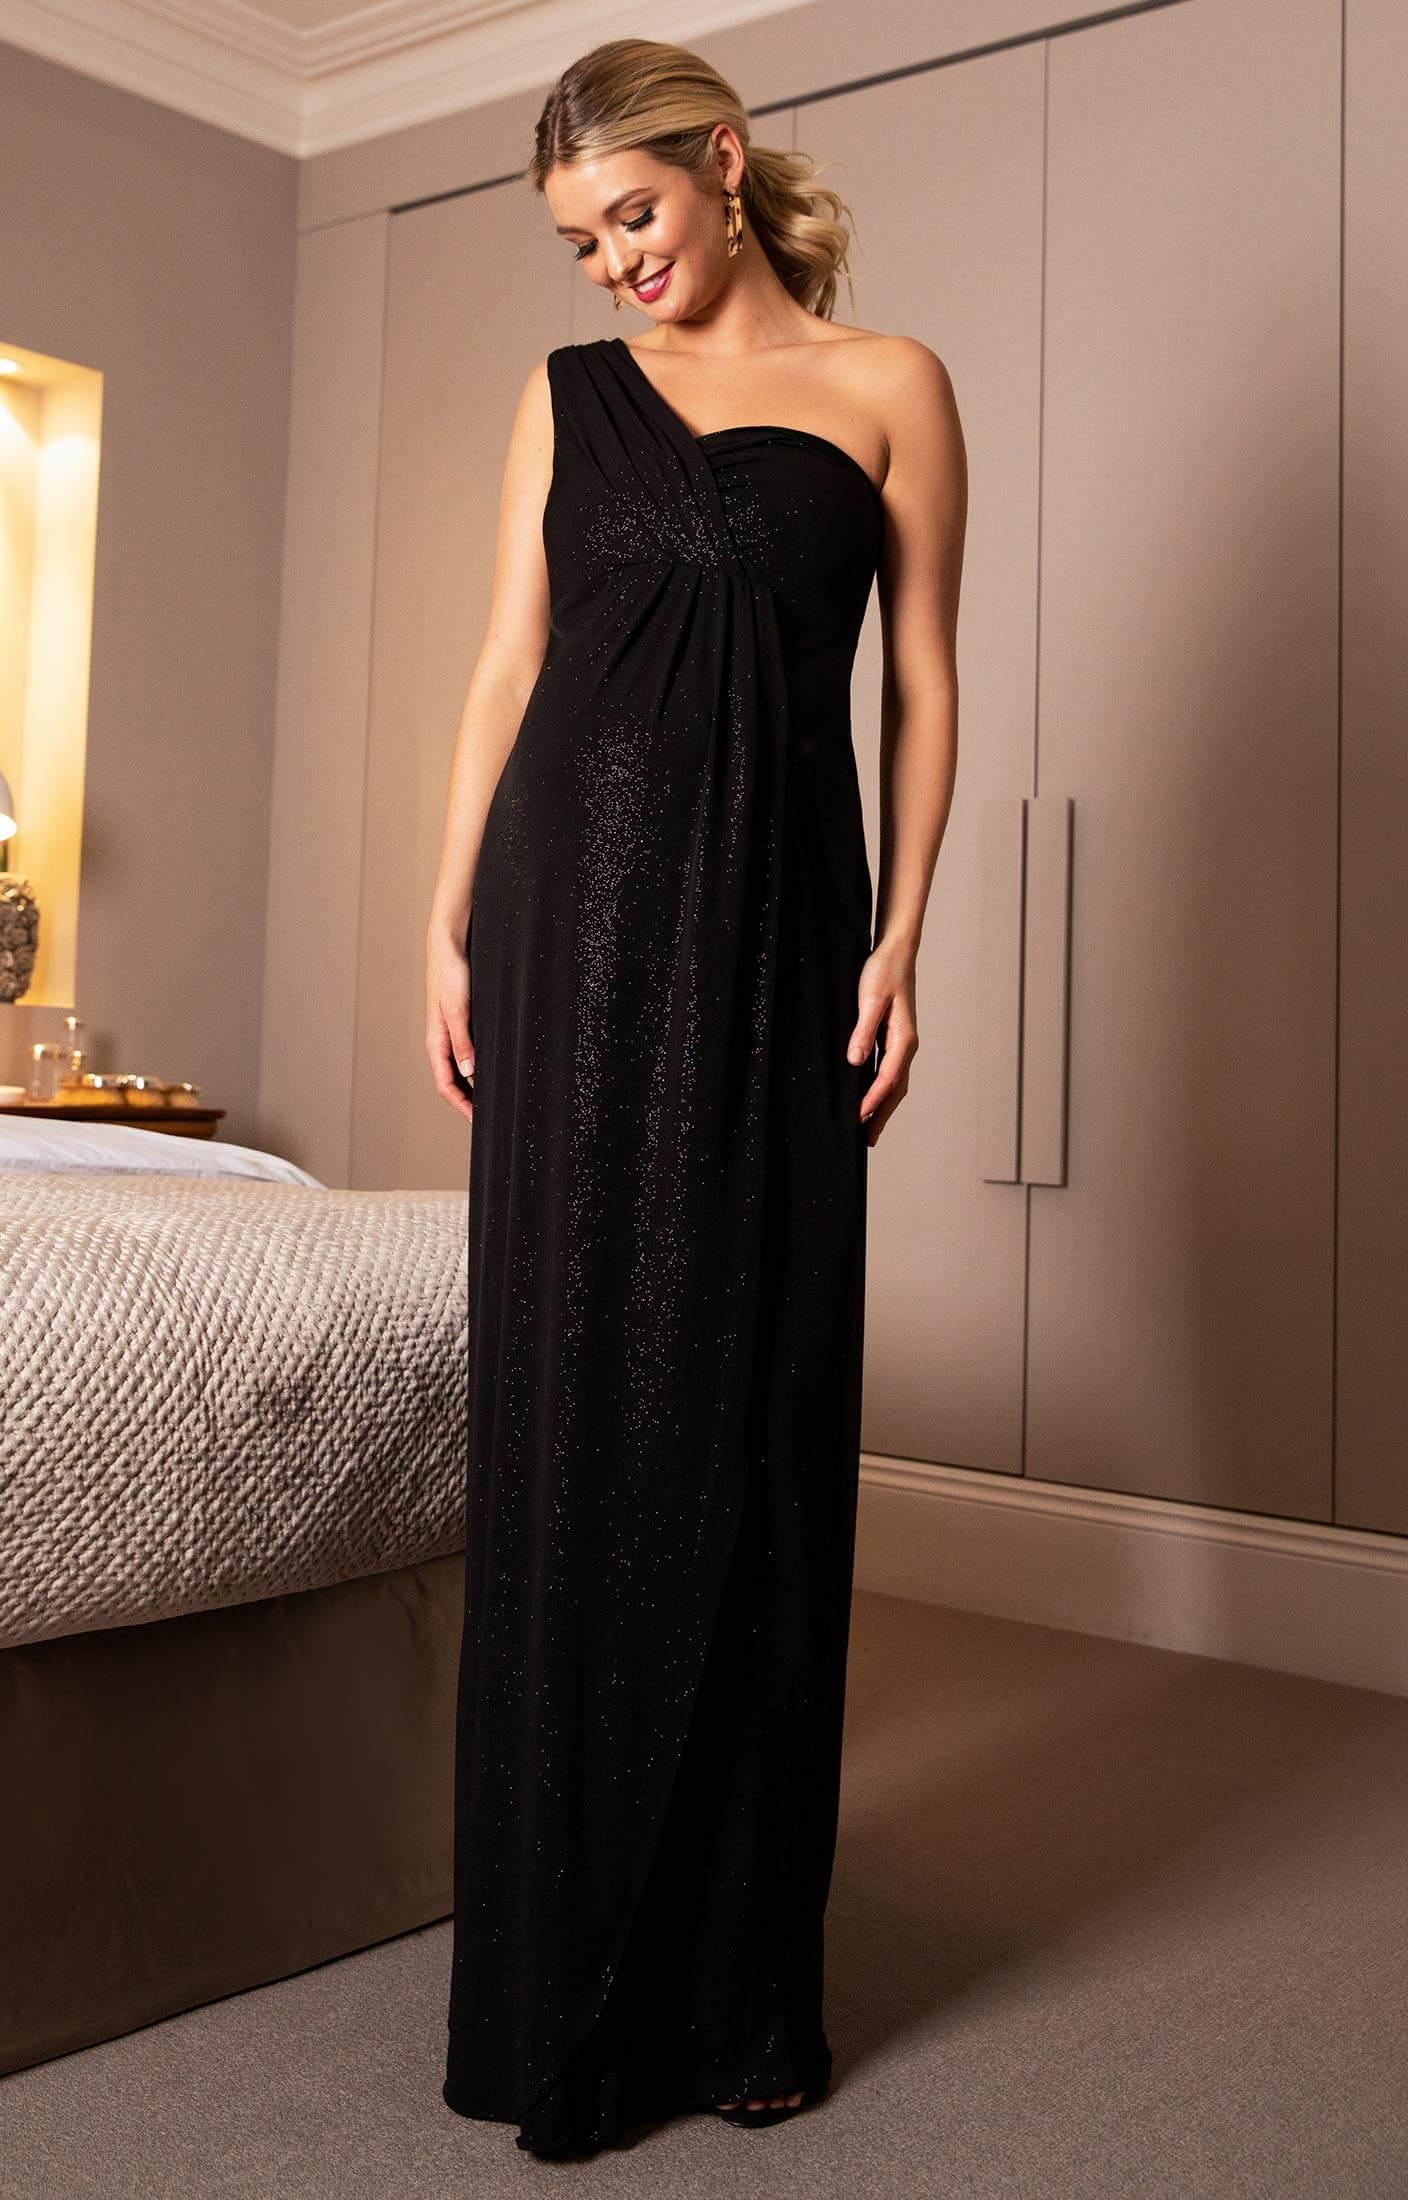 af973fe9386 Alessandra Maternity Dress Short Night Sky - Maternity Wedding ...